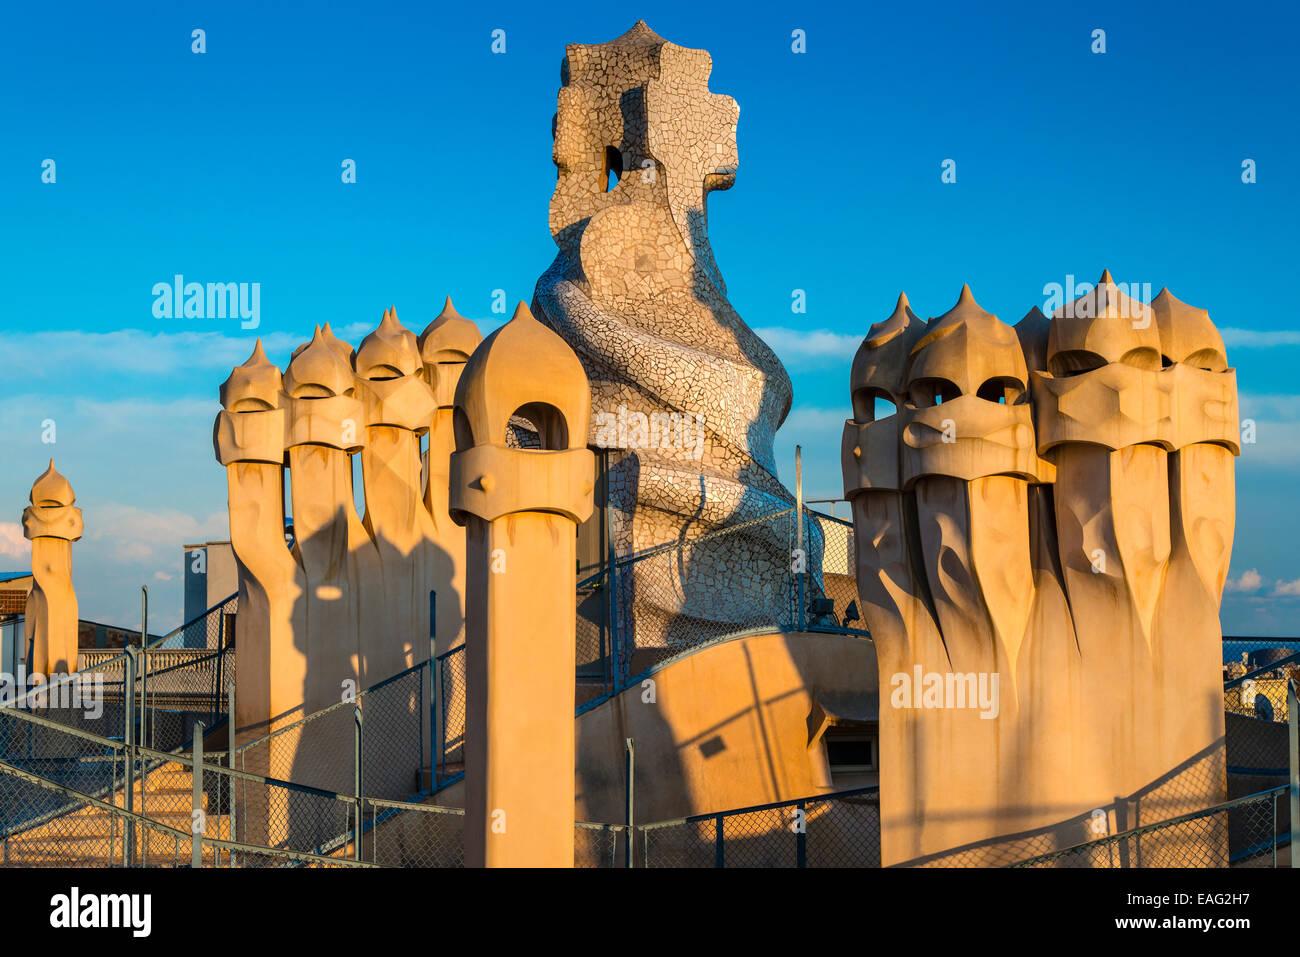 Rooftop of Casa Mila or La Pedrera, Barcelona, Catalonia, Spain - Stock Image